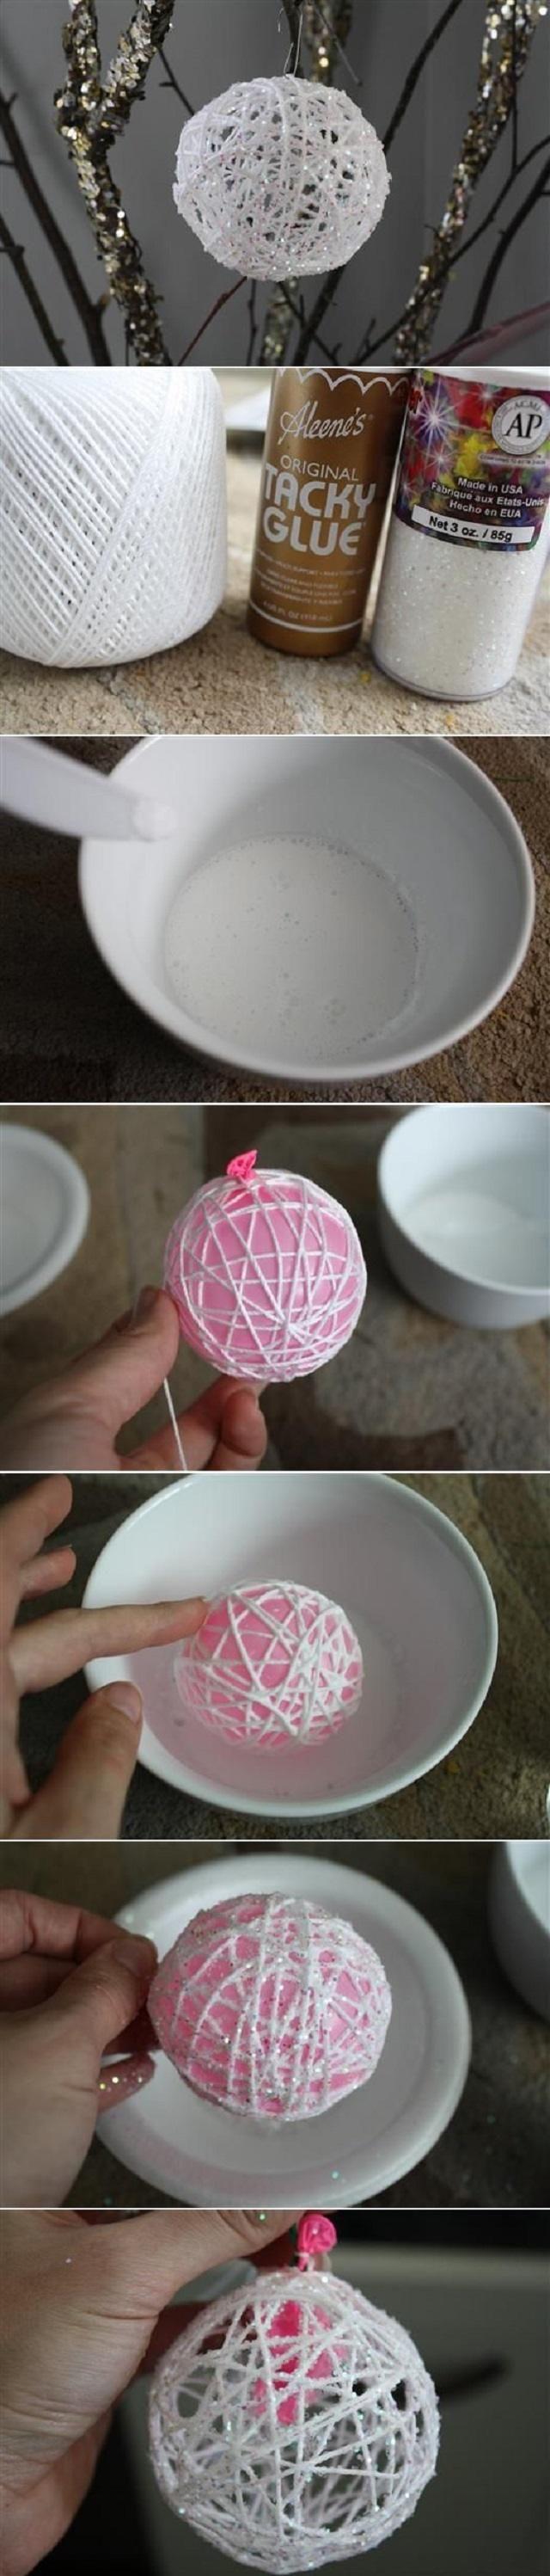 Christmas spheres - copy